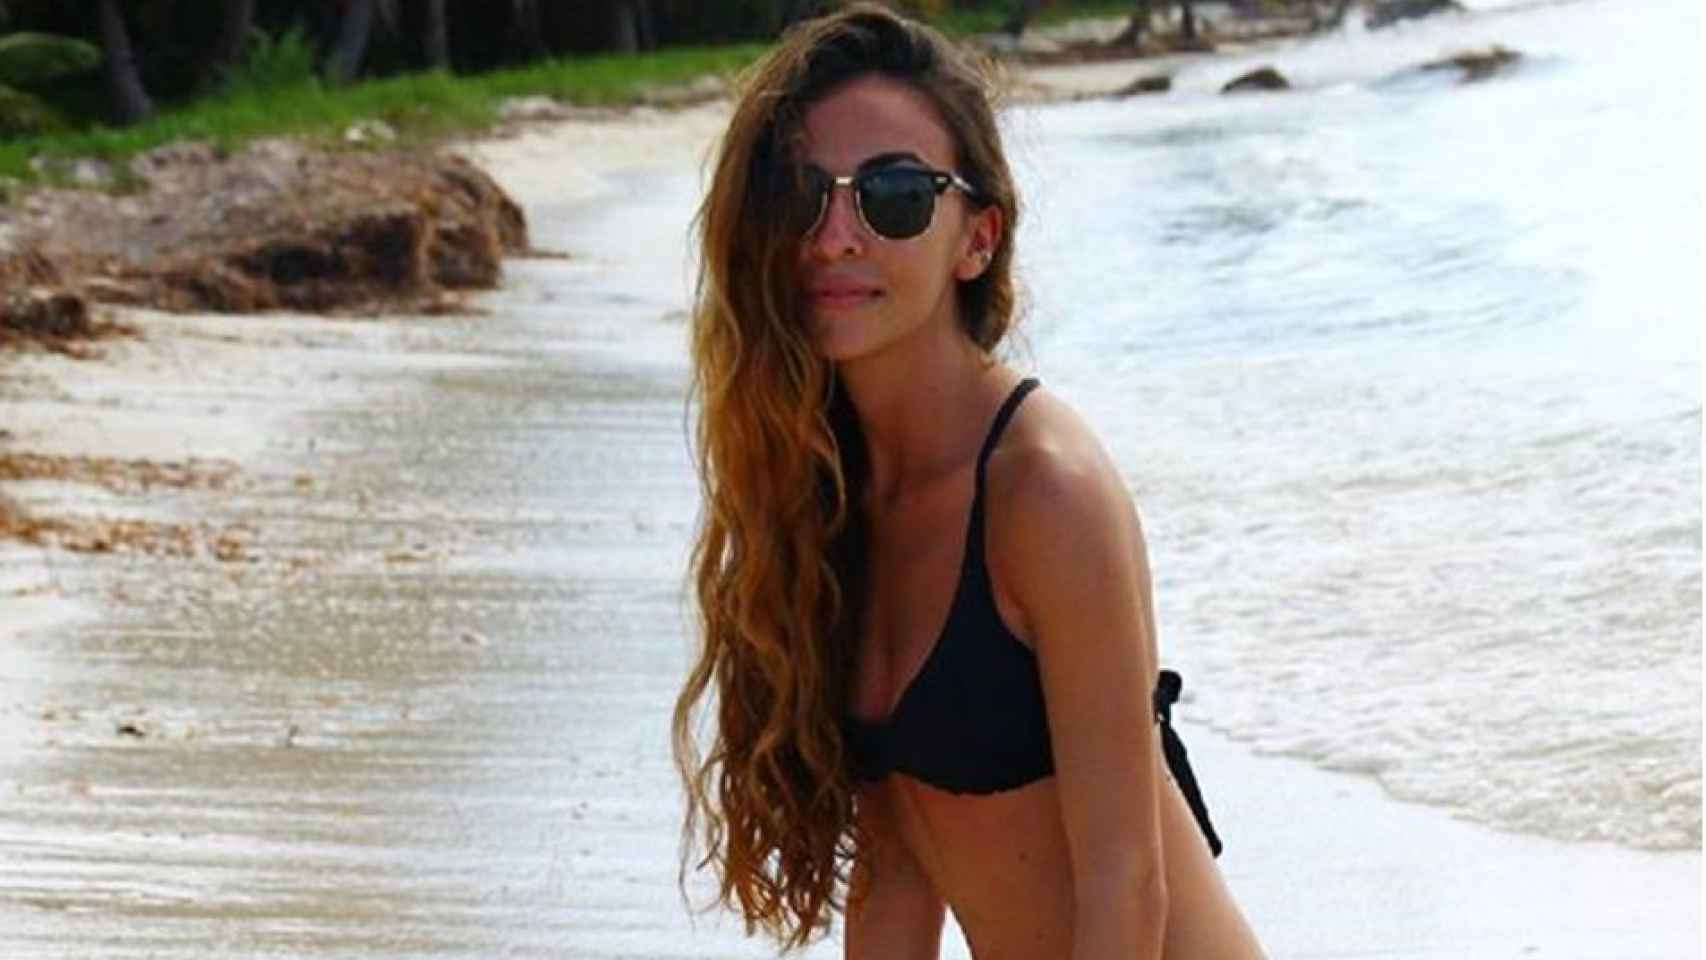 Así es Loreto Sesma, la novia de Willy Bárcenas